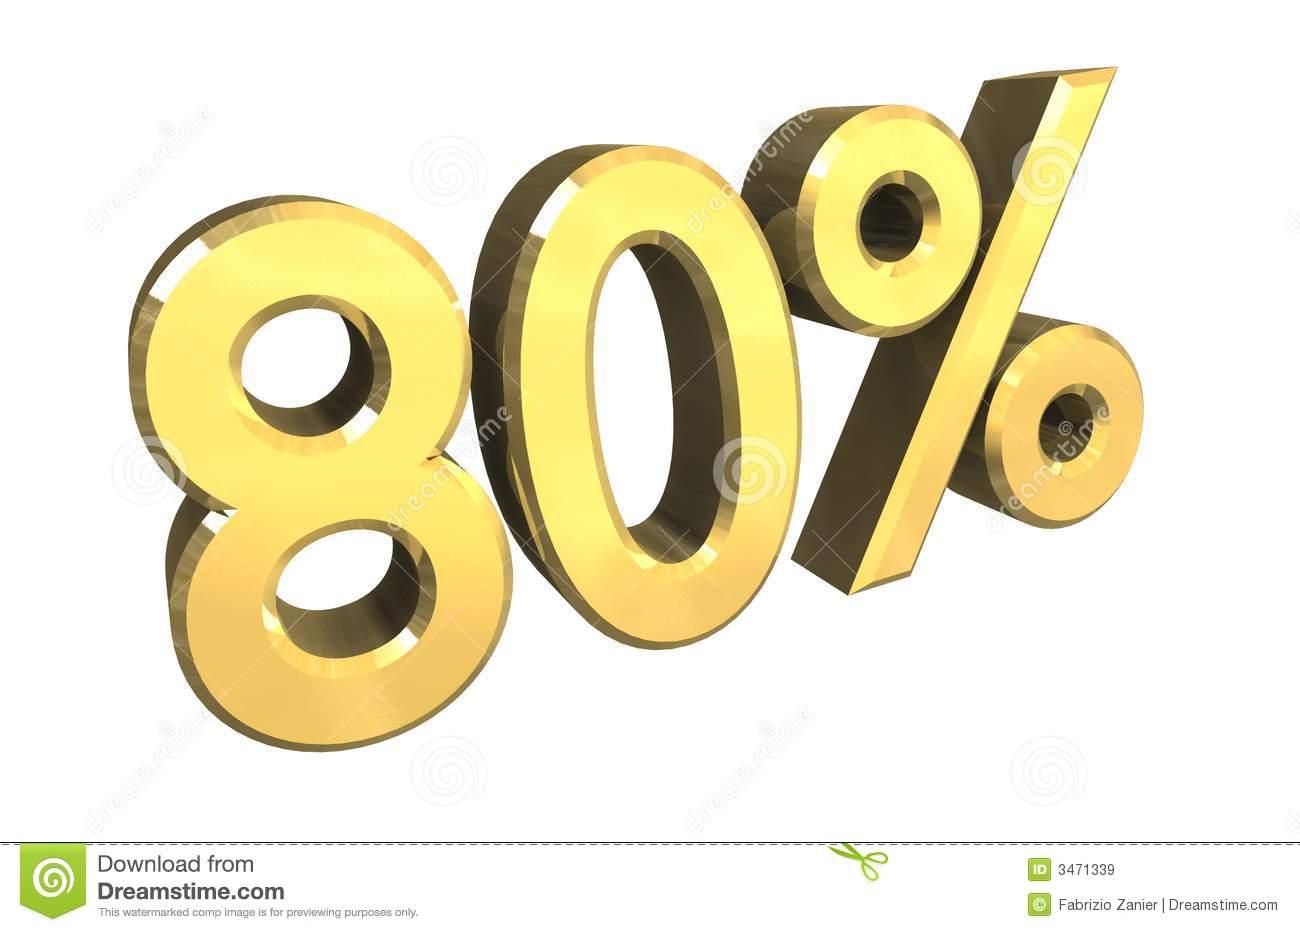 Eighty stock illustrations percent. Clipart zum 80 geburtstag